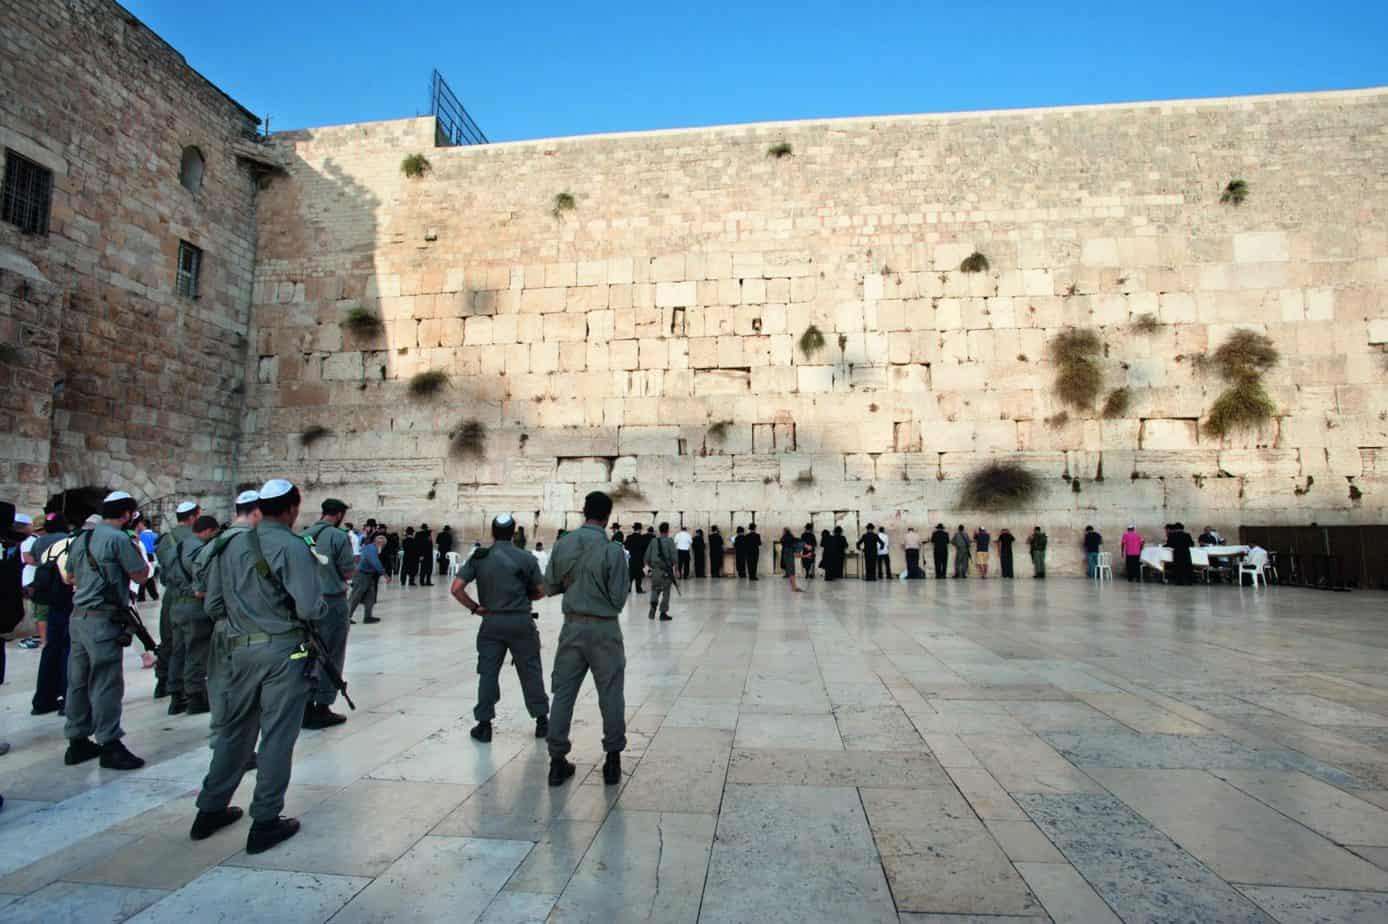 Israel : Europeans must understand Israel's reality